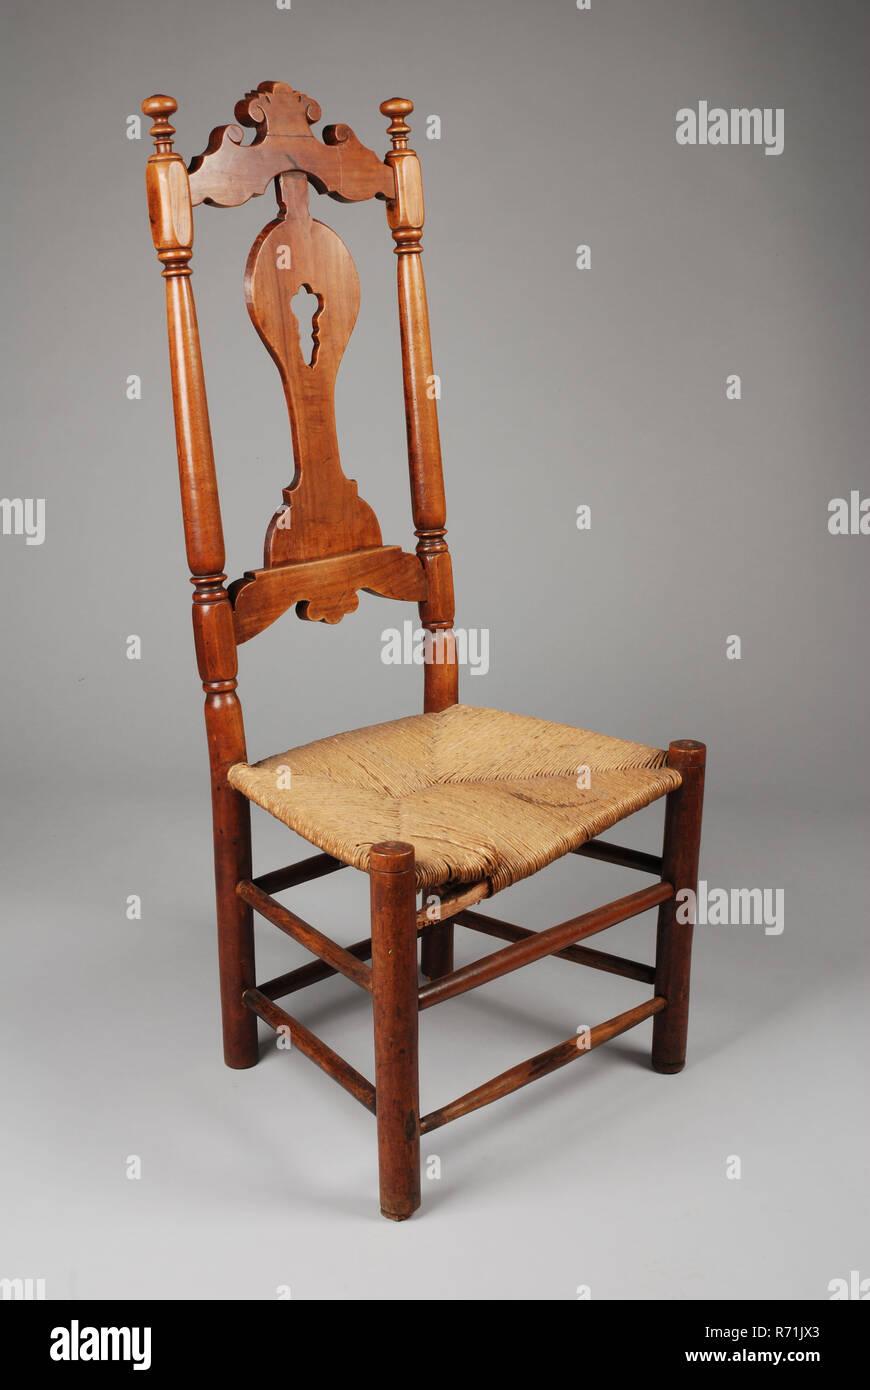 Cherry-wood straight chair, chair furniture furniture interior